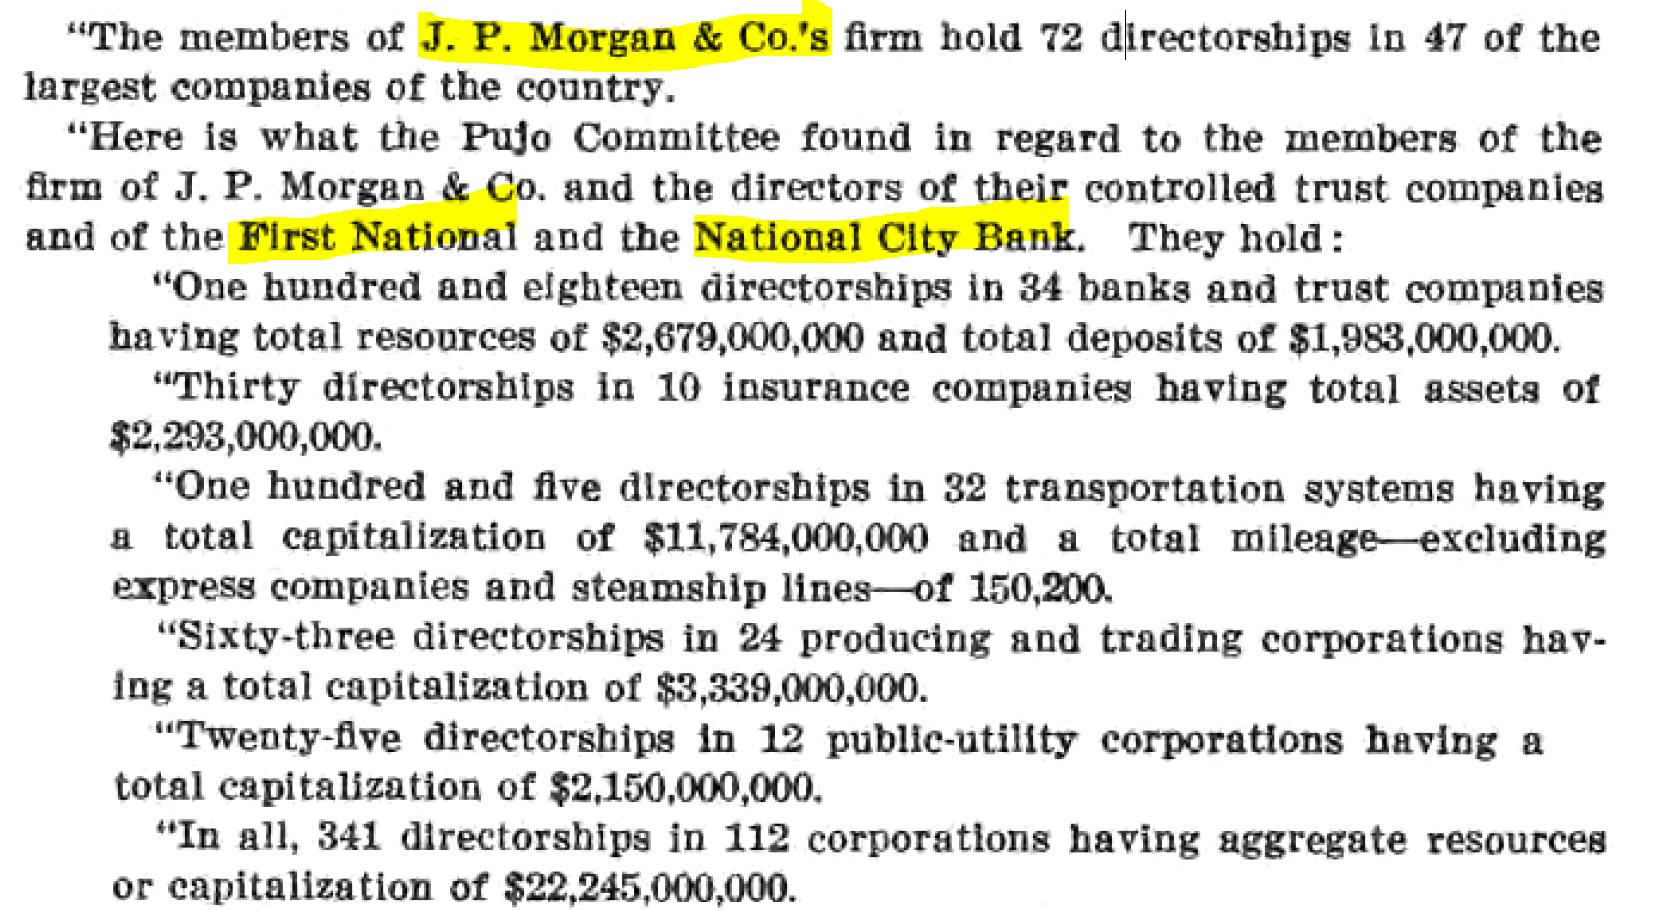 James M. Mead, Chairman. (Jun. 30, 1950). Report on Interlocking Directorates, p. 22. U.S Federal Trade Commission.